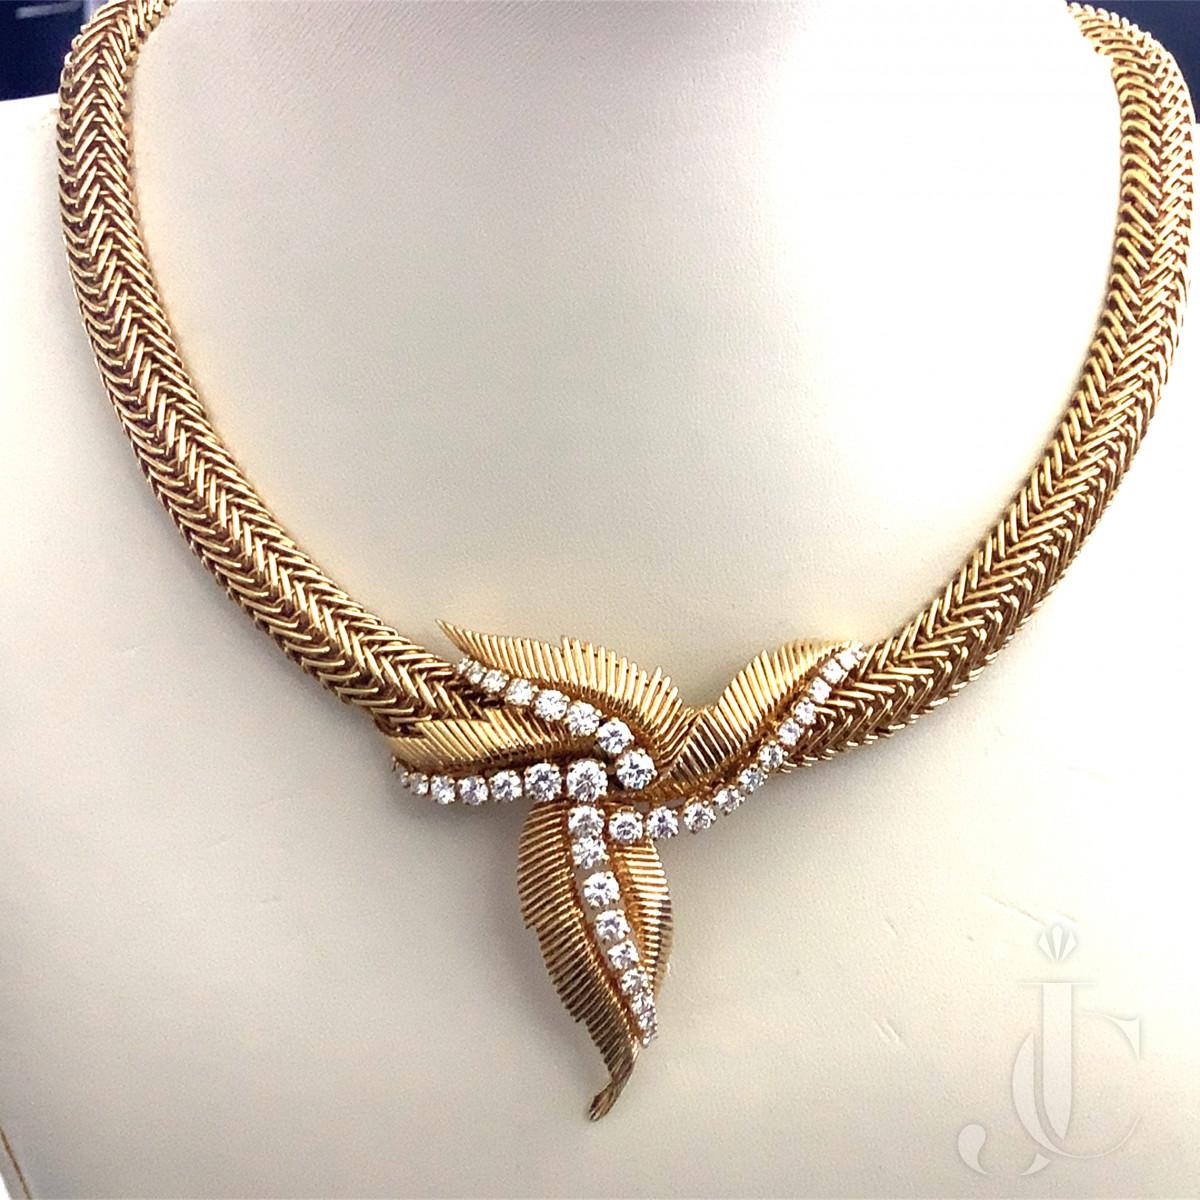 Mauboussin Diamond Necklace